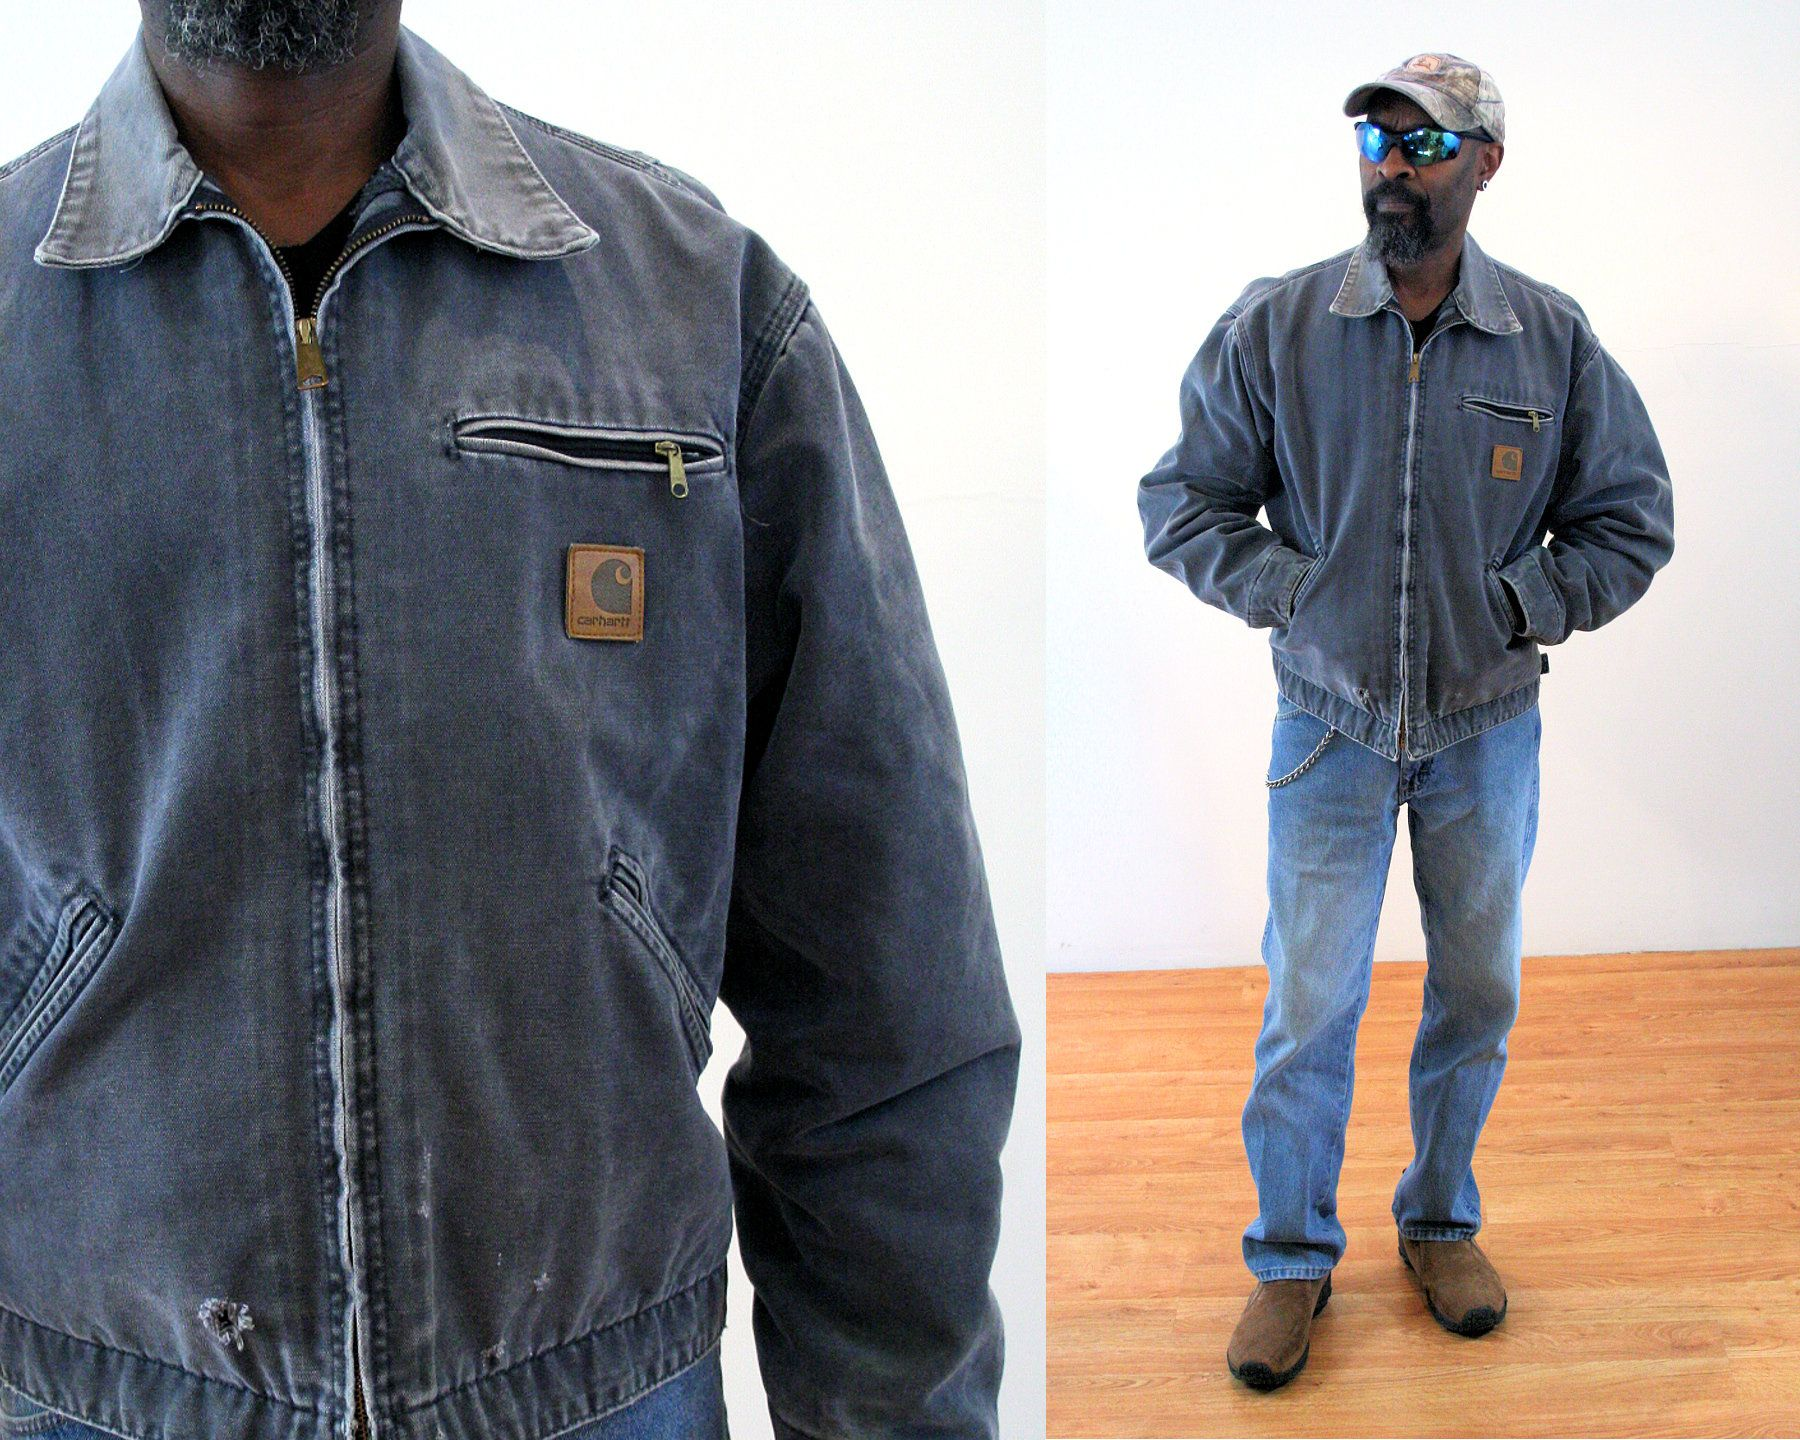 80s Carhartt Jacket L Gray Blanket Lined Heavy Duty Vintage Workwear Chore Coat Large Carhartt Jacket Vintage Flannel Shirt Jackets [ 1440 x 1800 Pixel ]